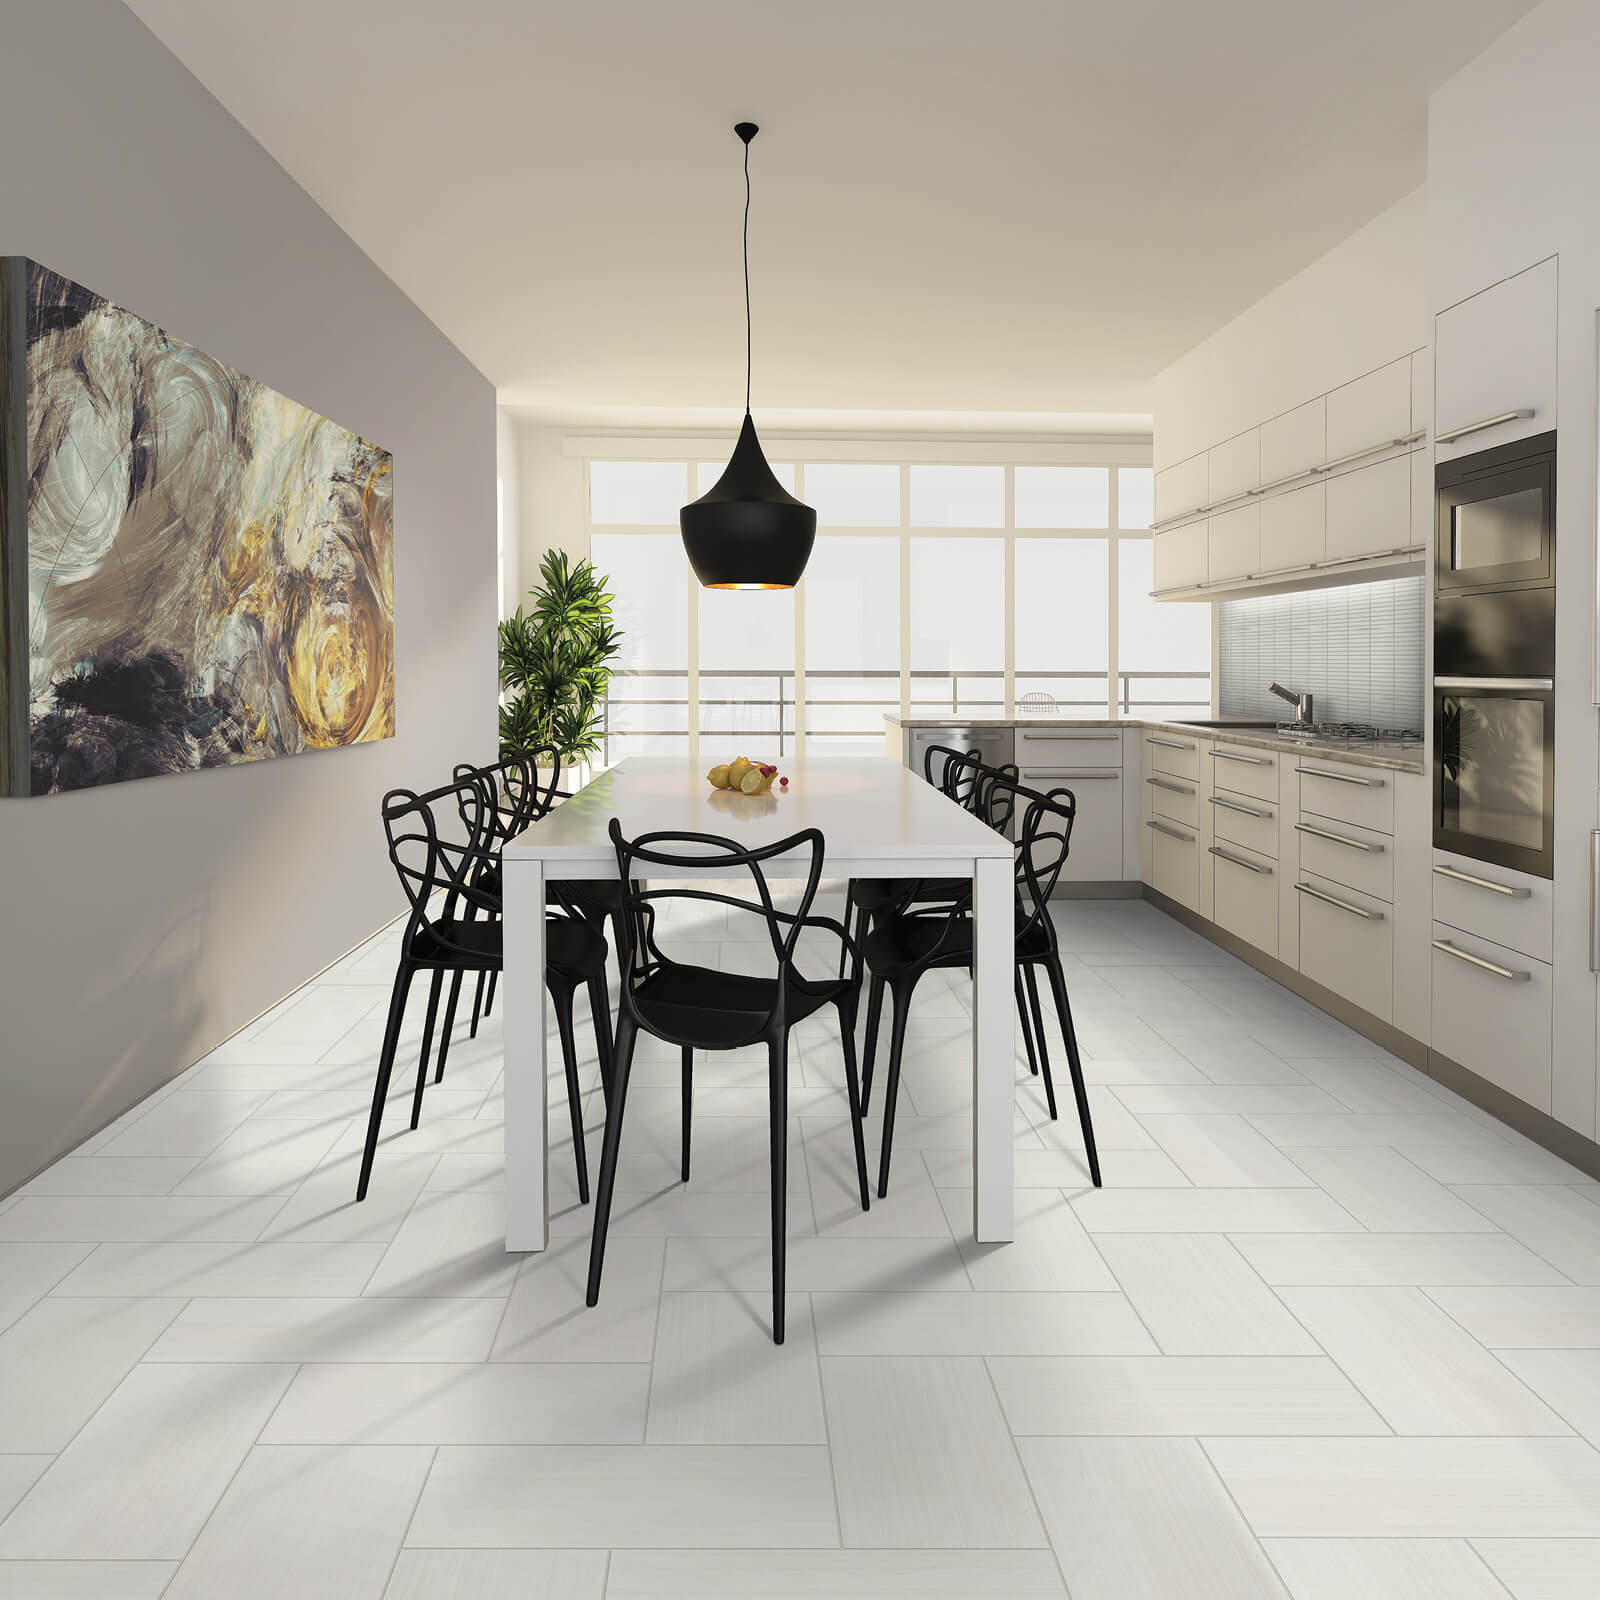 Dining room interior | McSwain Carpet & Floors